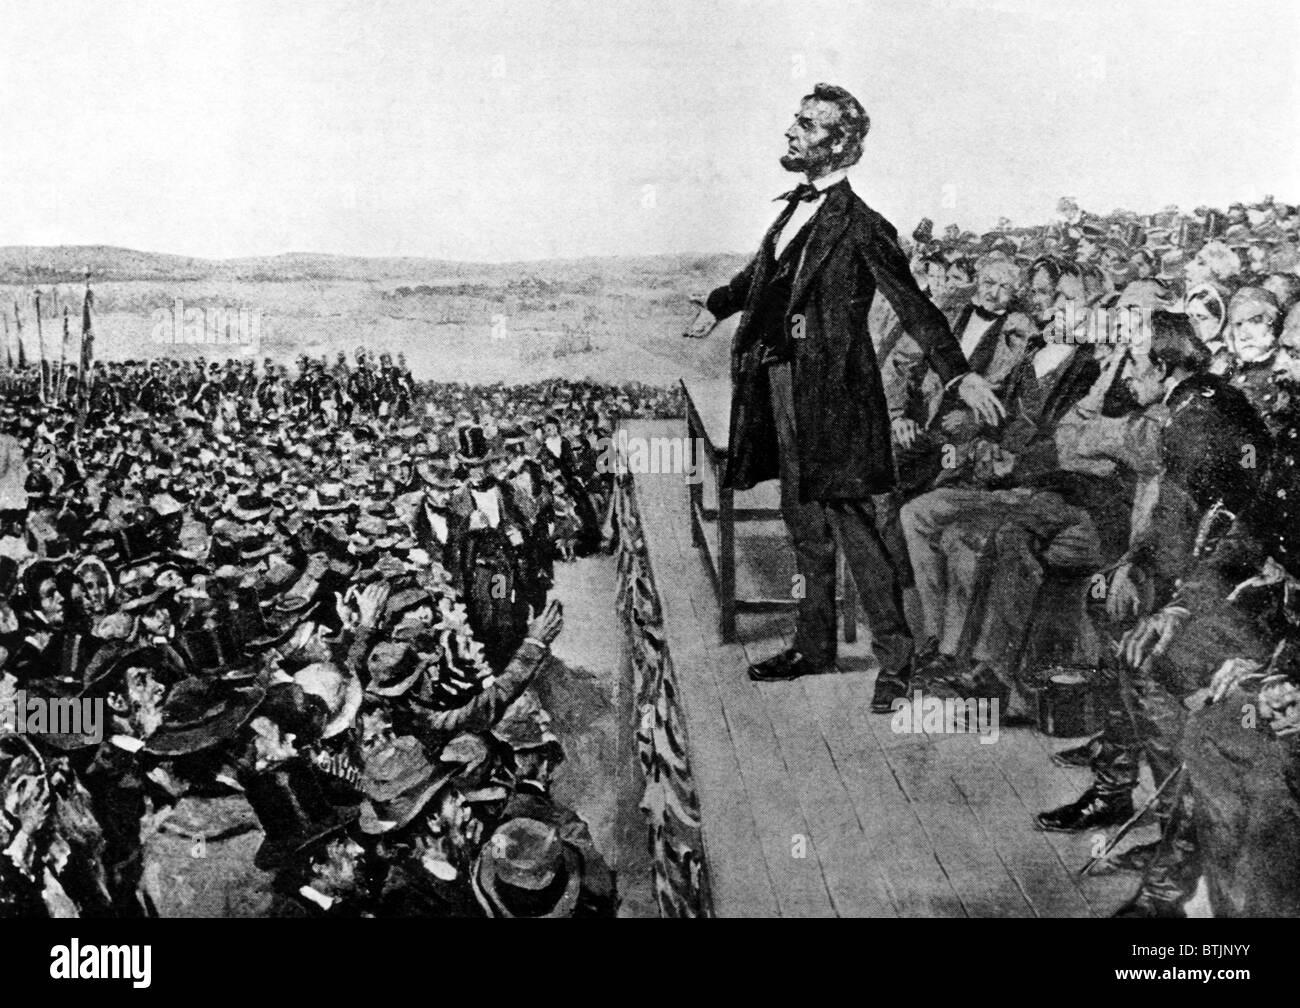 Abraham Lincoln (1809-1865), U.S. President (1861-1865), A.T. Keller sketch  of Lincoln's Gettysburg Address in Gettysburg Pennsy